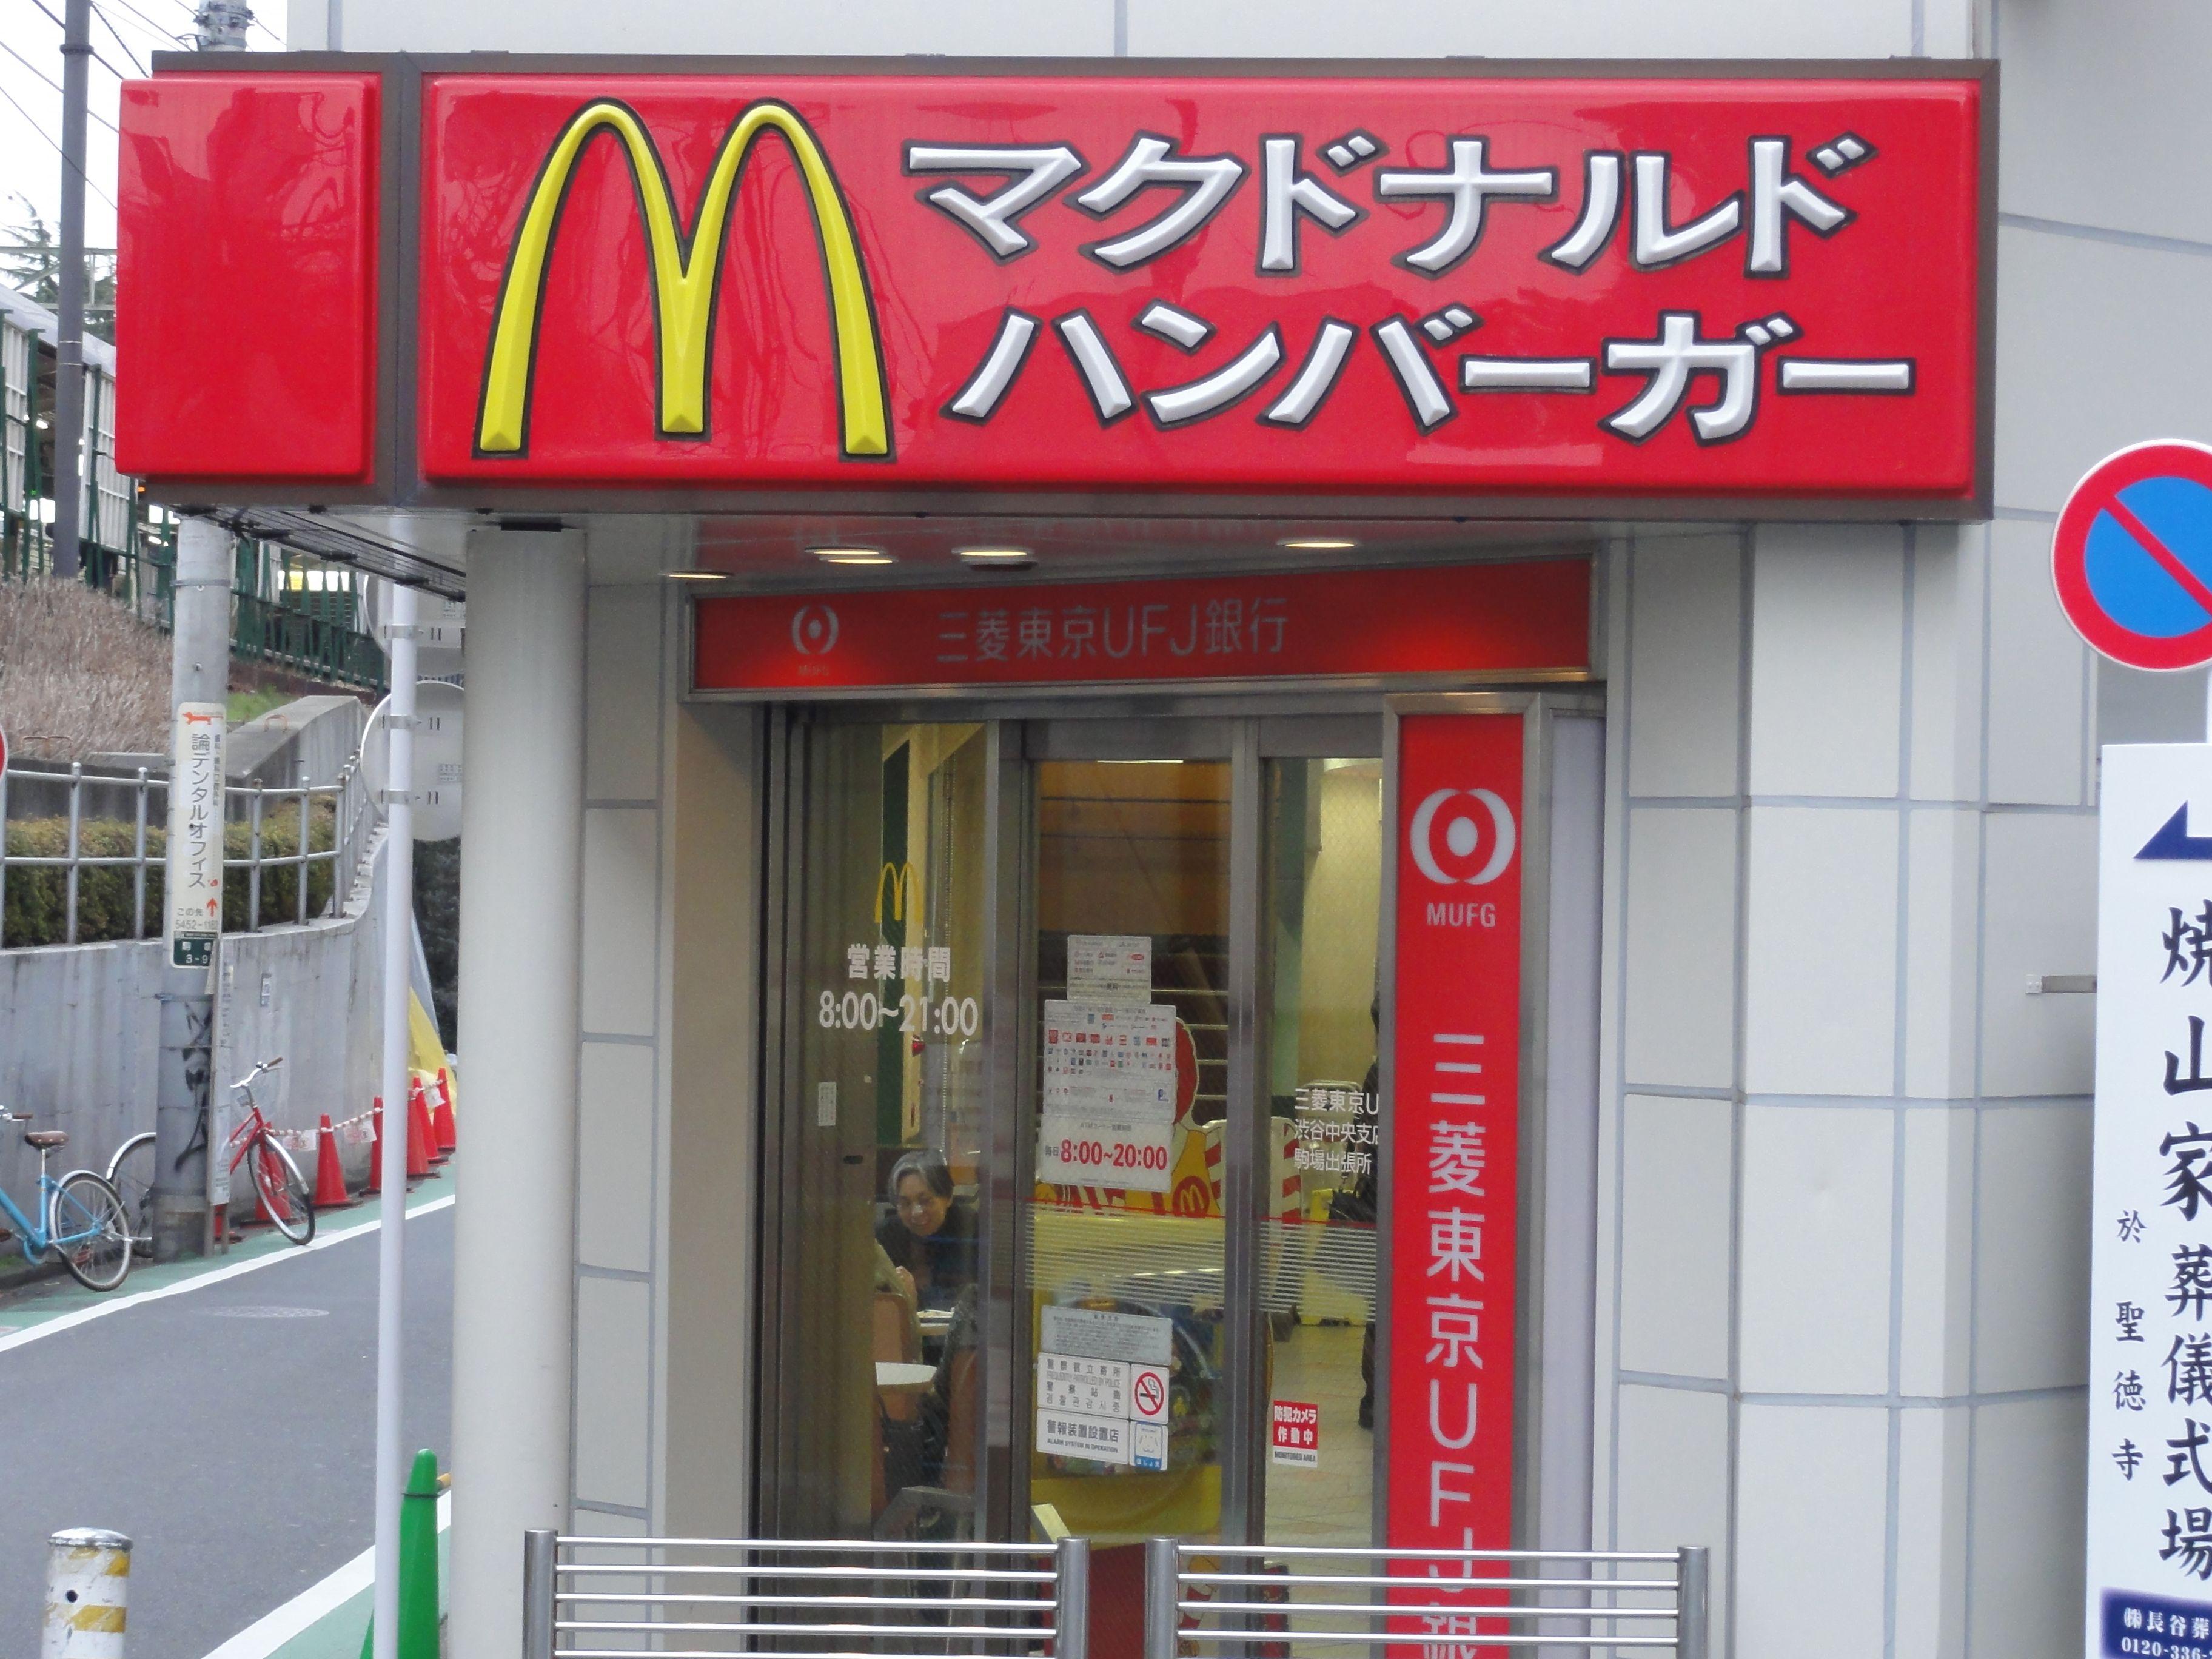 Katakana Japanese Reading Practice Mcdonald S Japan Sign Reading Practice Learn Japanese Signs